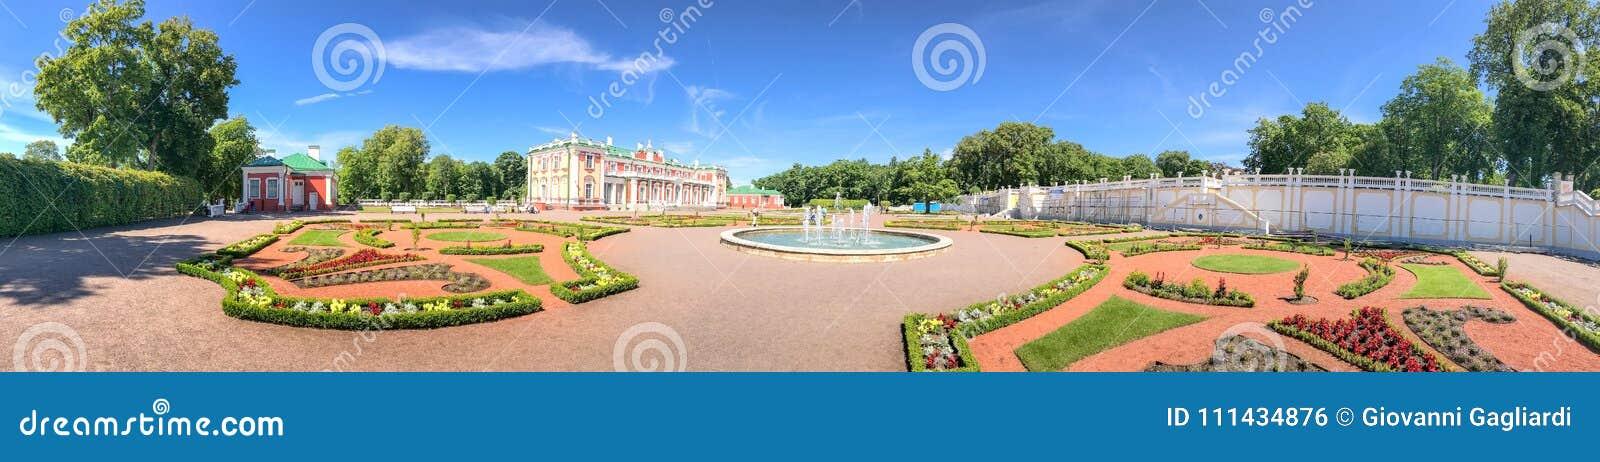 TALLINN, ESTONIE - 15 JUILLET 2017 : Château de Kadriorg de visite de touristes